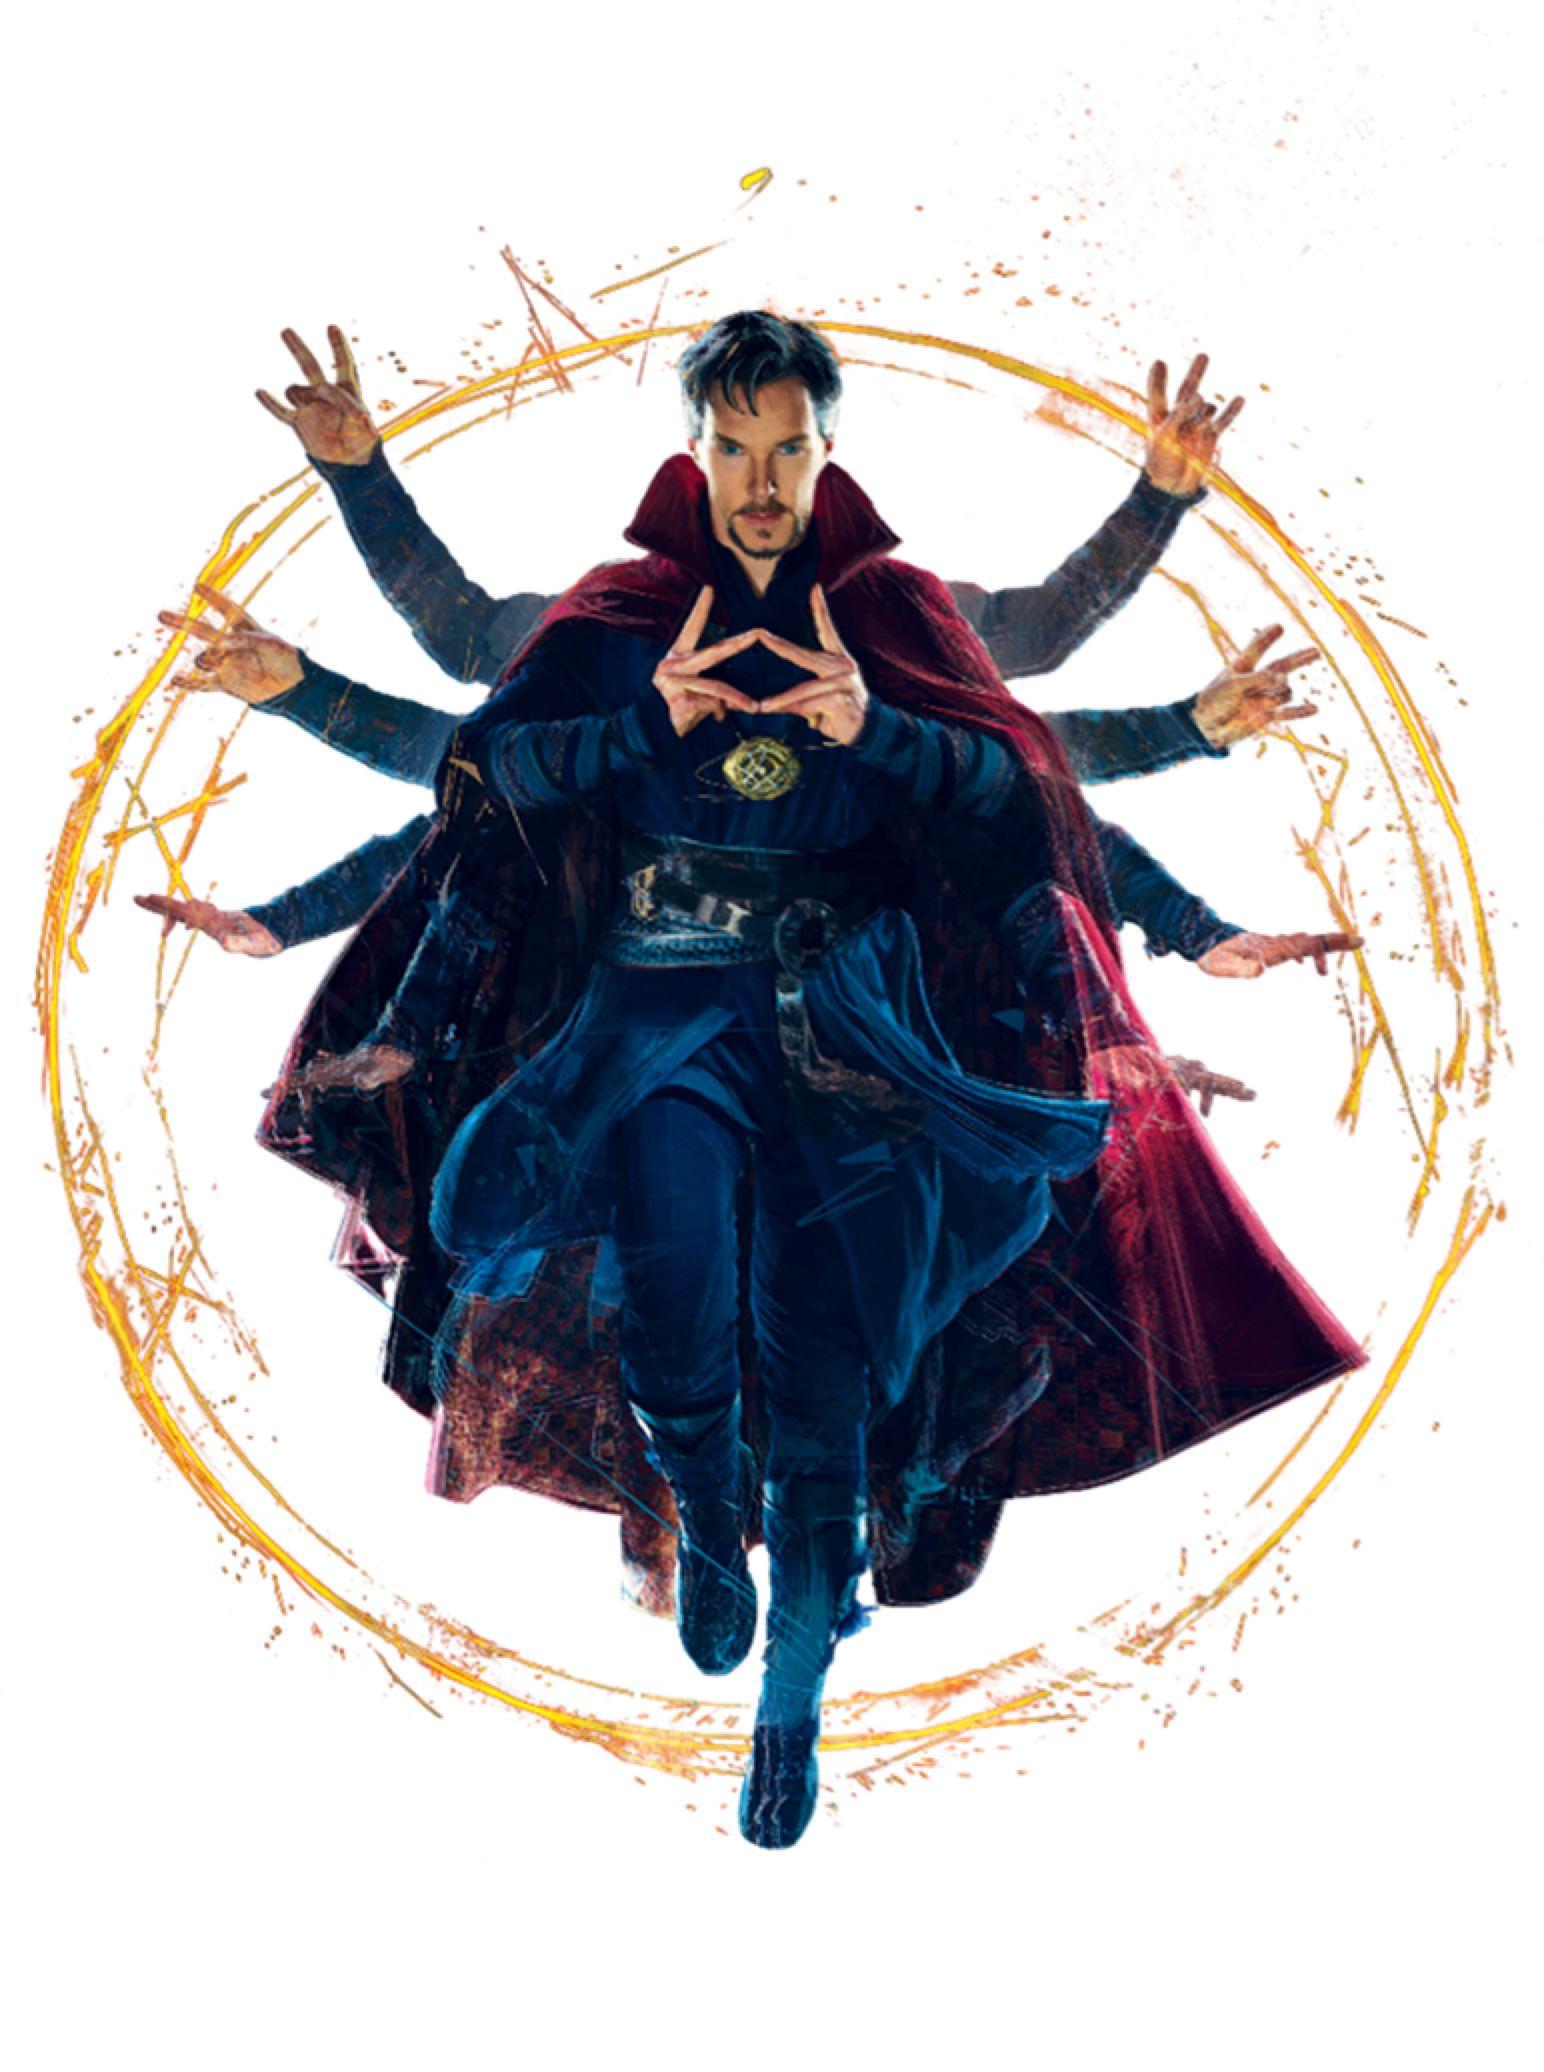 Infinity War Doctor Strange 3 Png By Captain Kingsman16 On Deviantart Doctor Strange Avengers Infinity War Strange